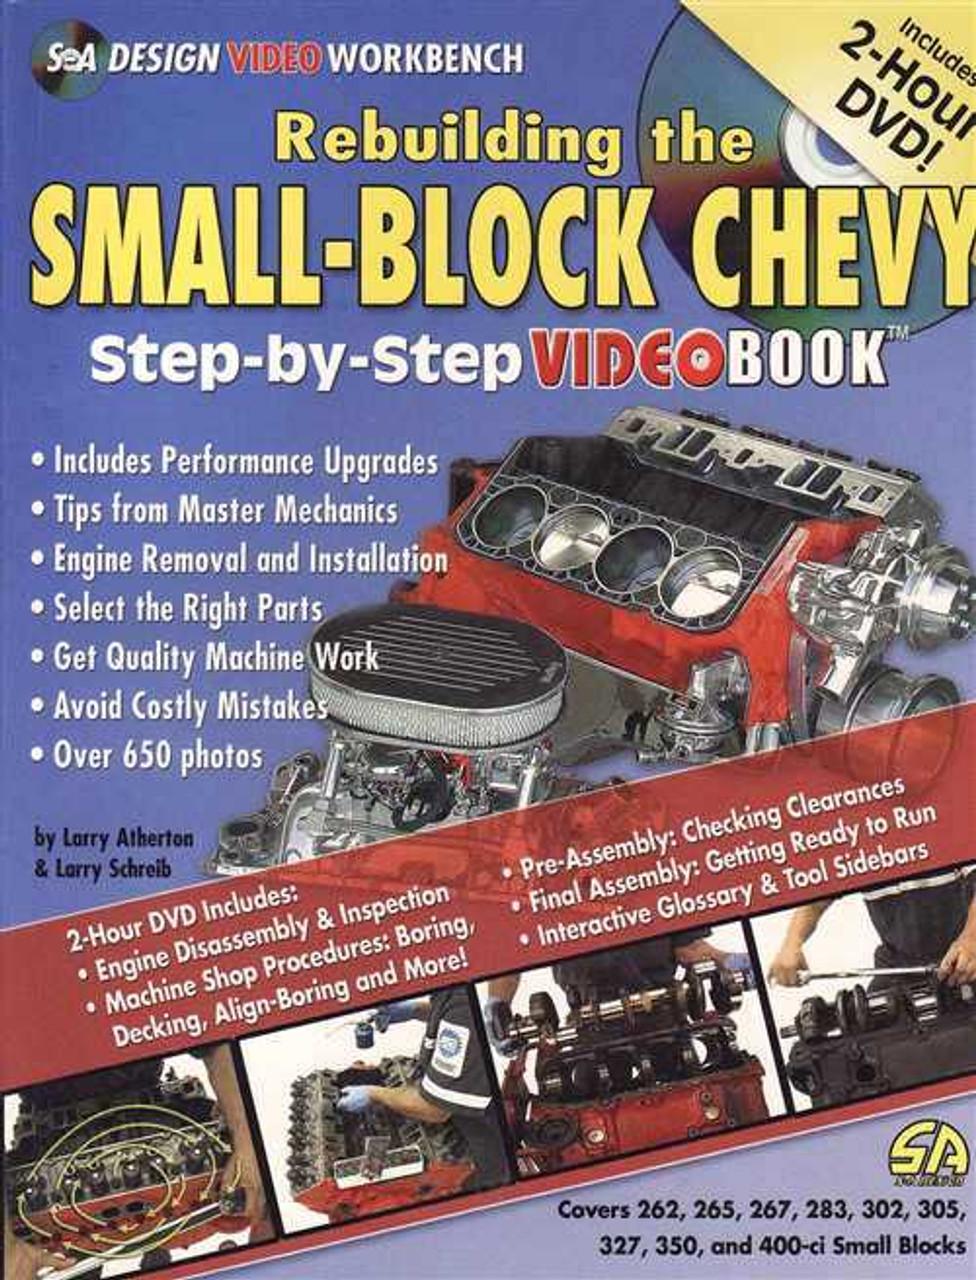 rebuilding the small block chevy video book rh automotobookshop com au Small Block Chevy Engine Rebuild Book Rebuild Small Block Chevy Specifications